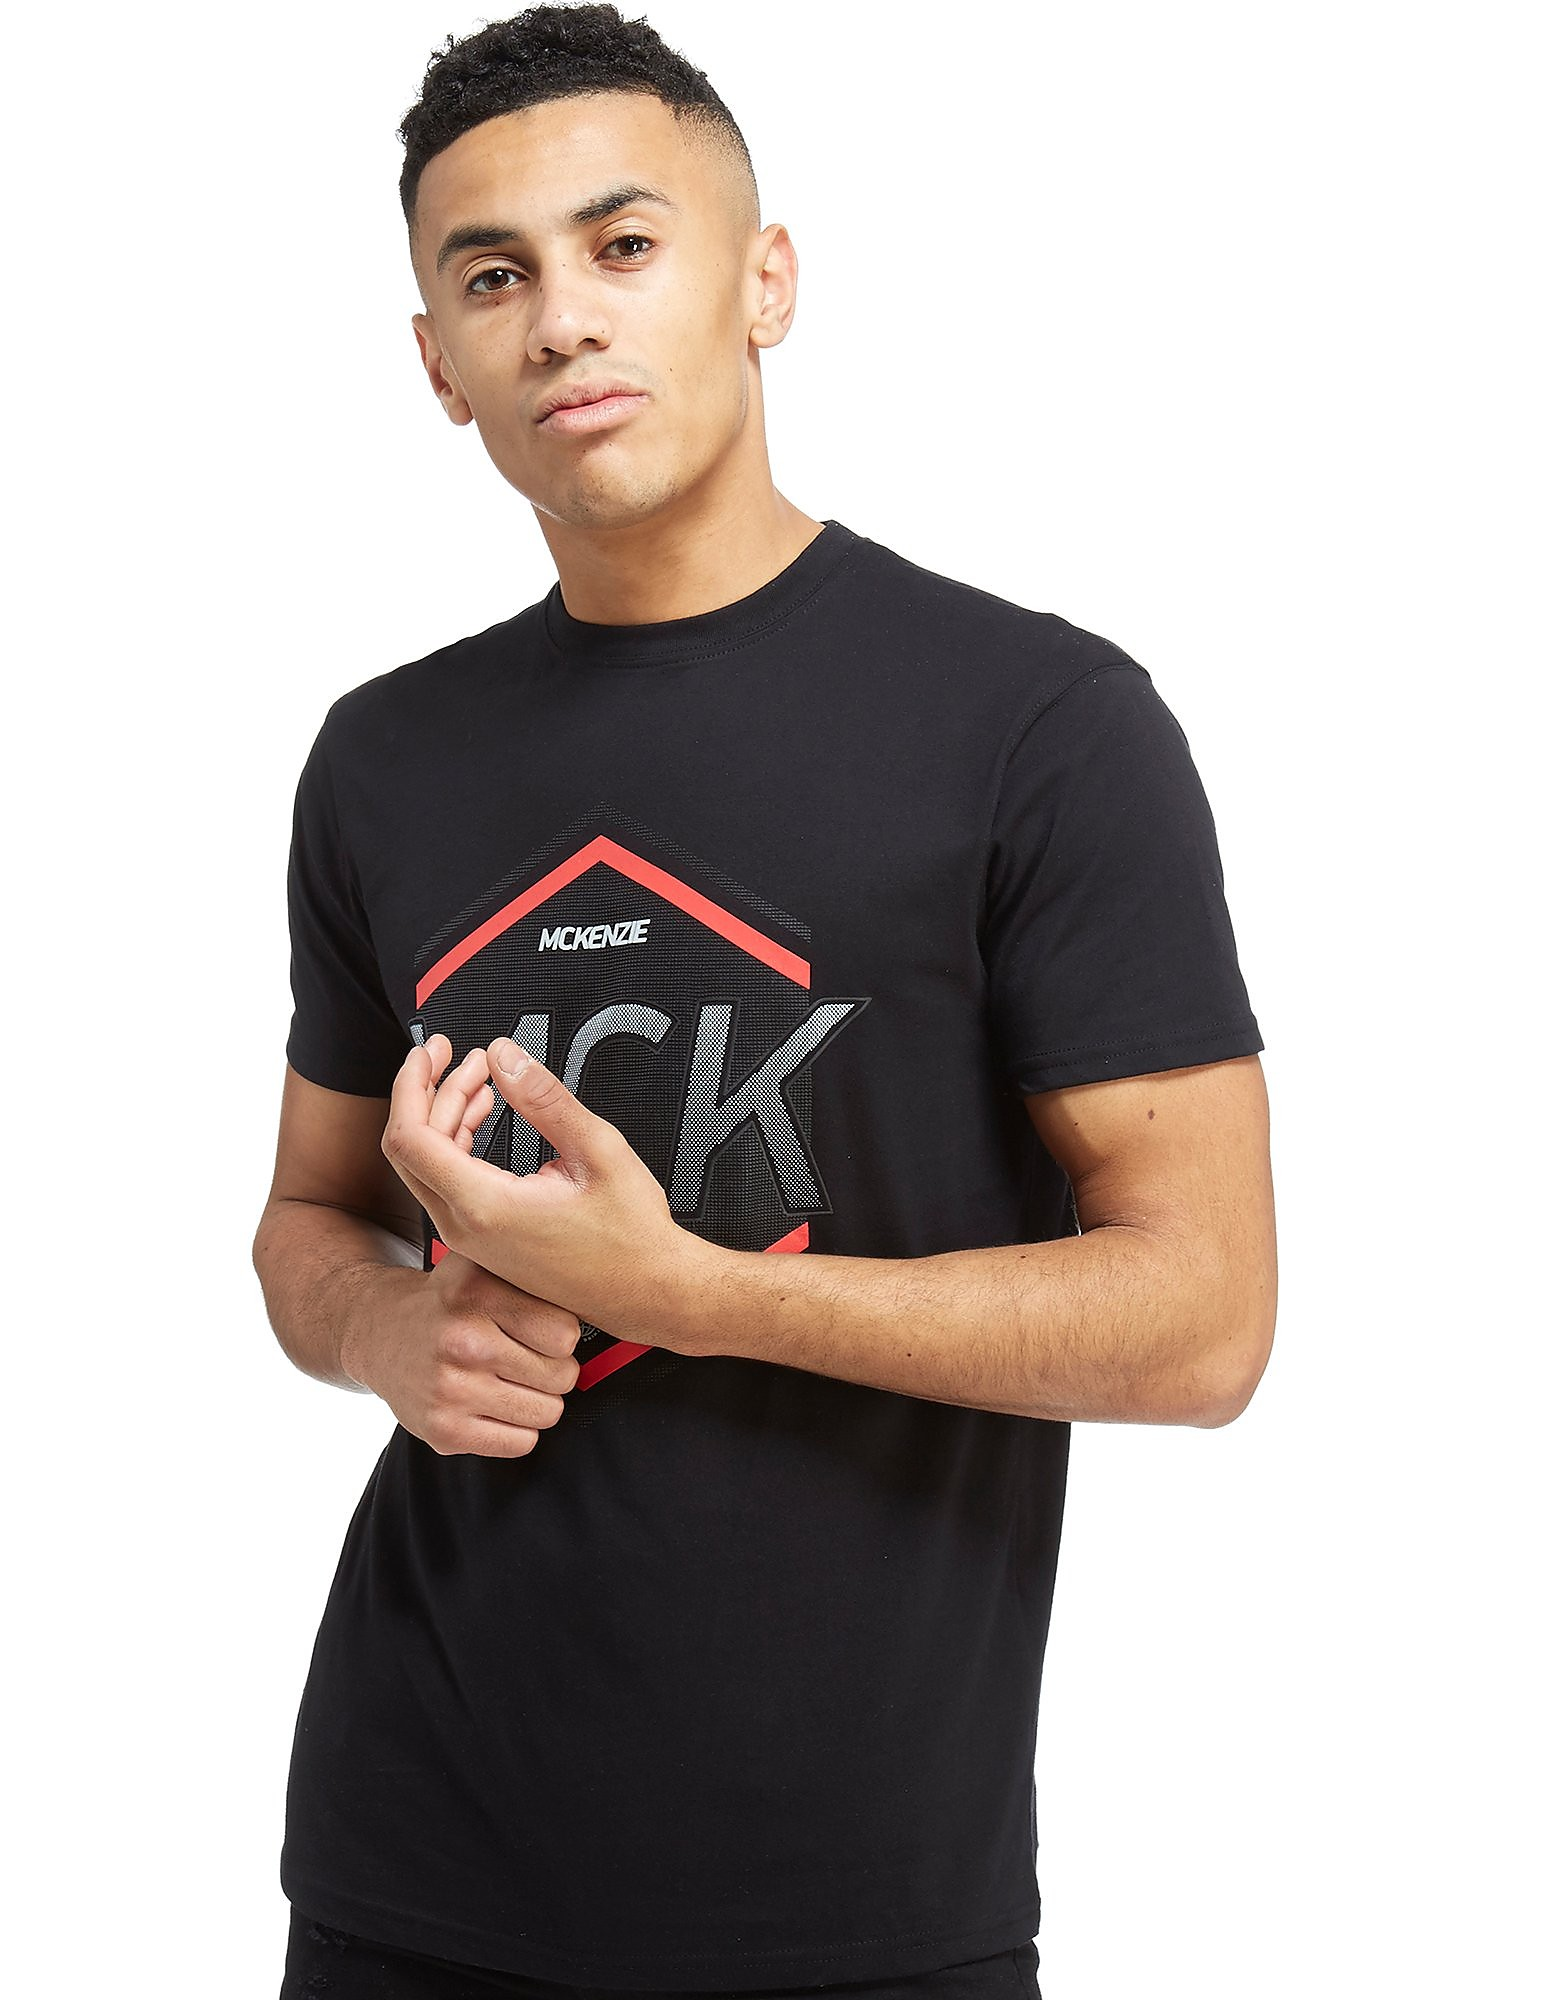 McKenzie Ispus T-Shirt